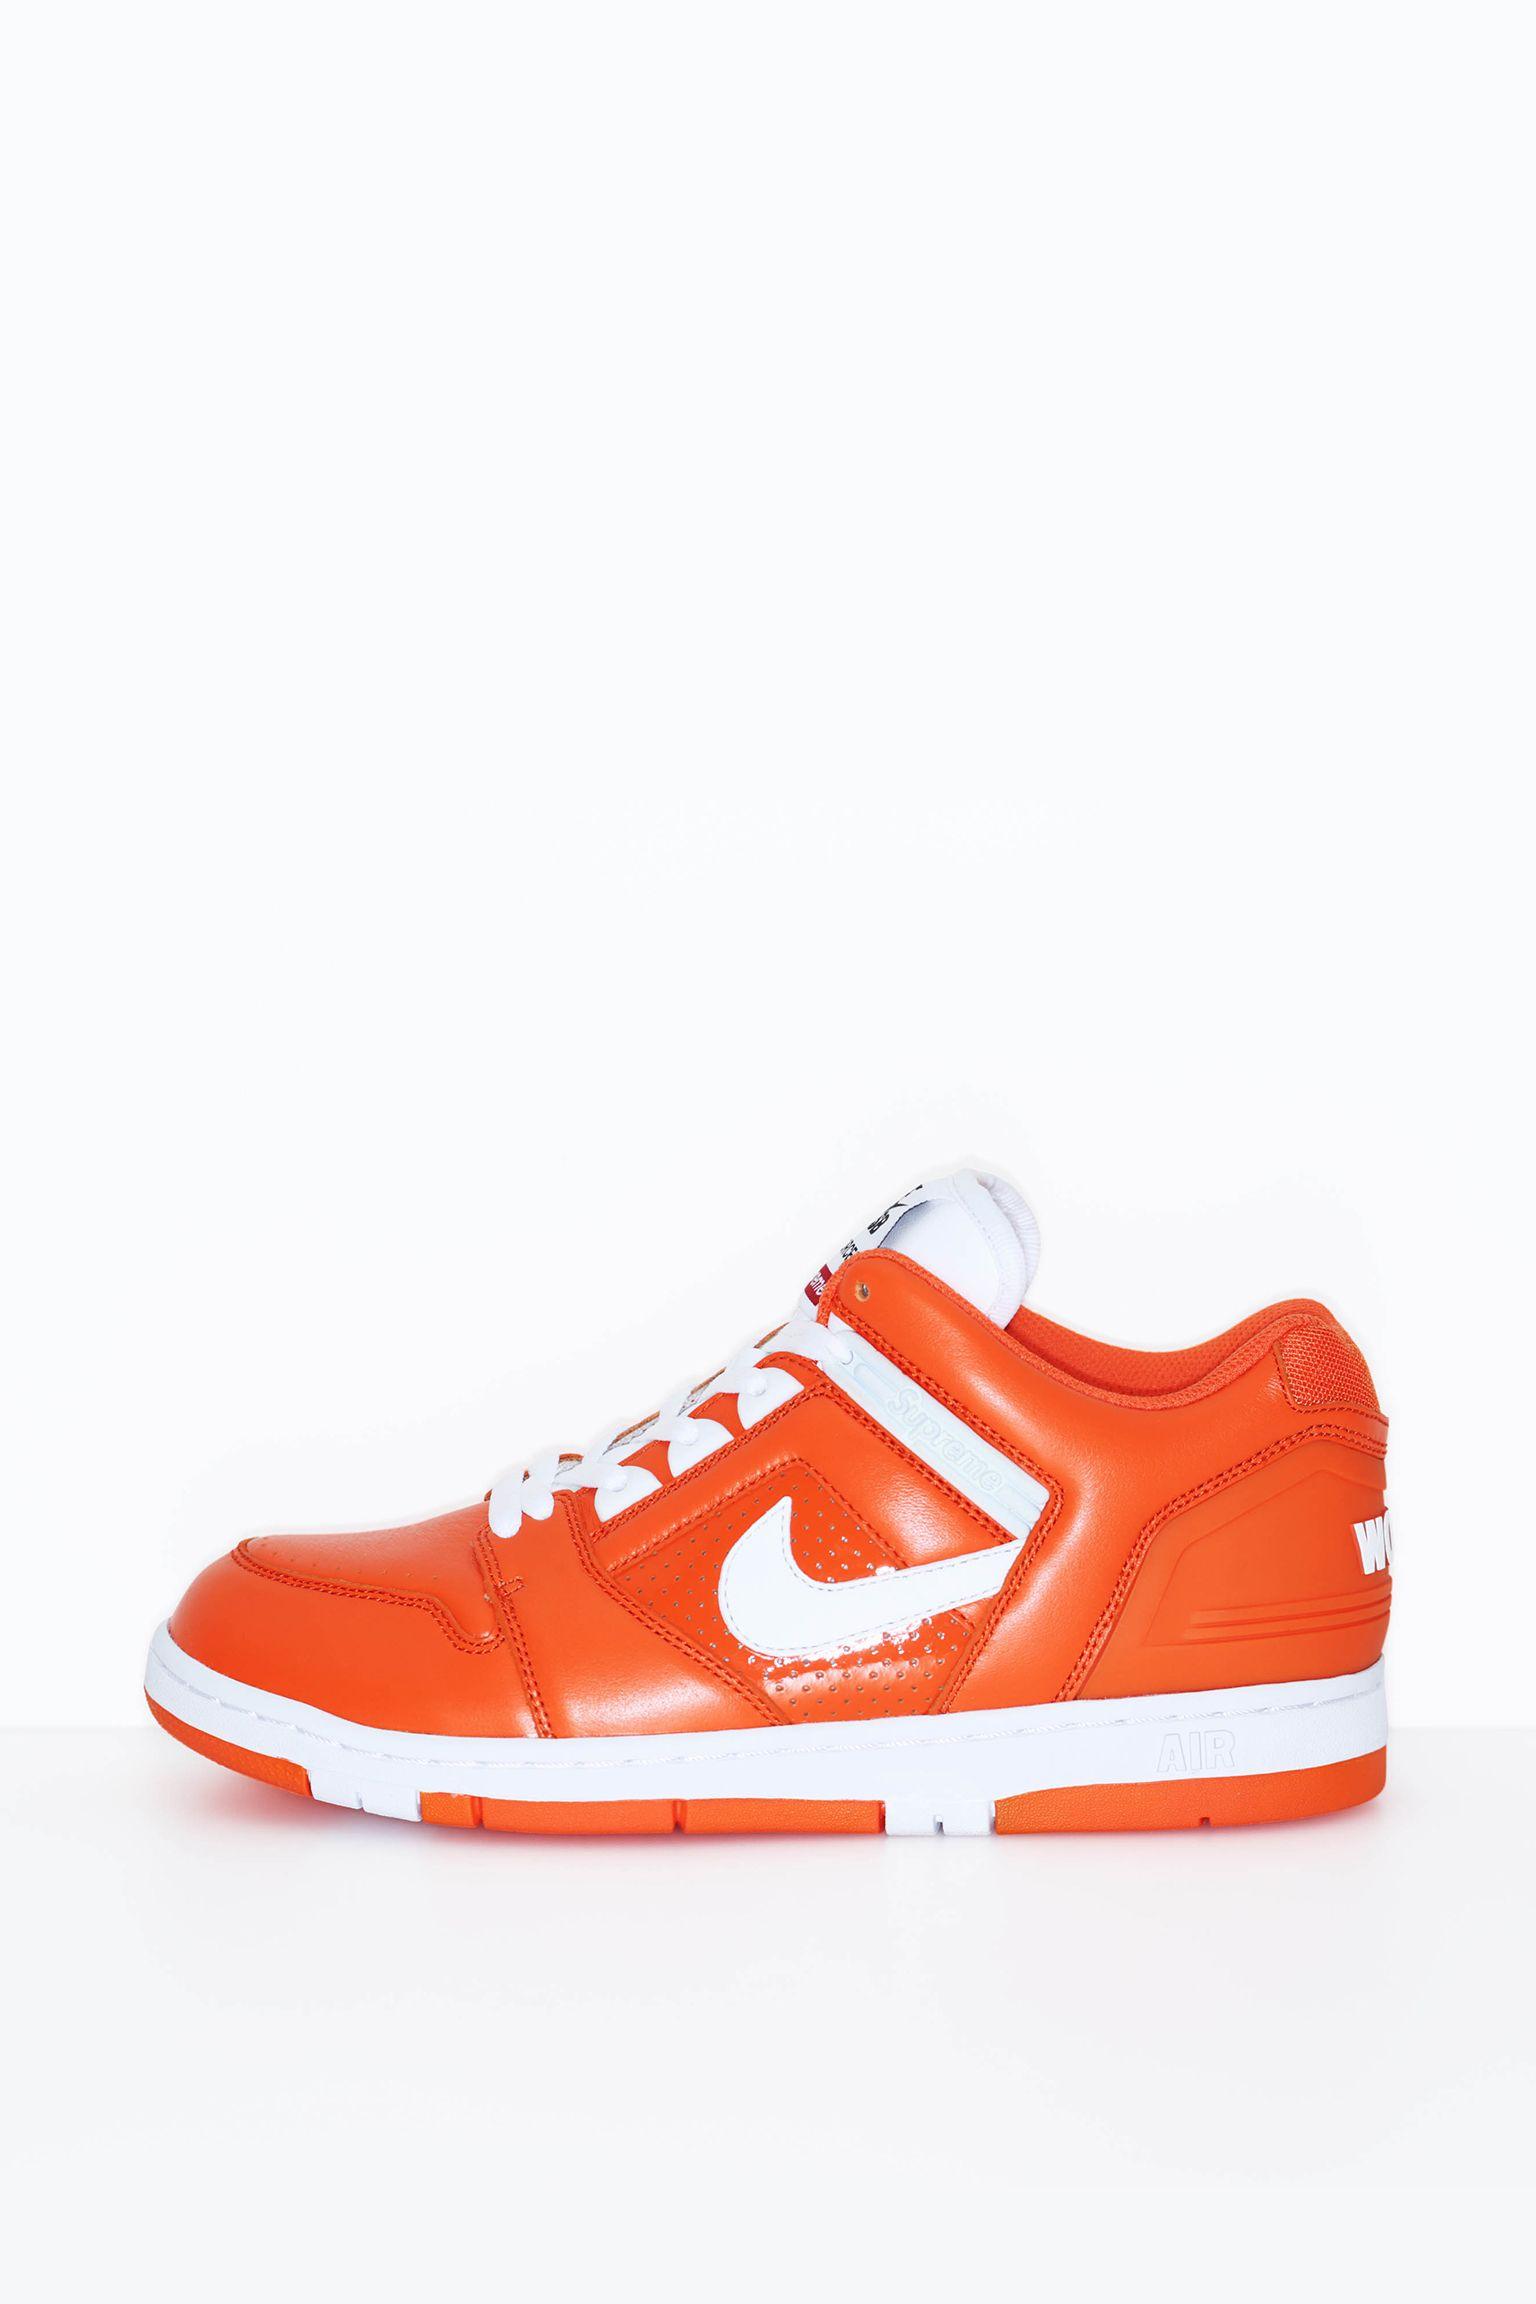 Nike SB Air Force 2 Low x Supreme